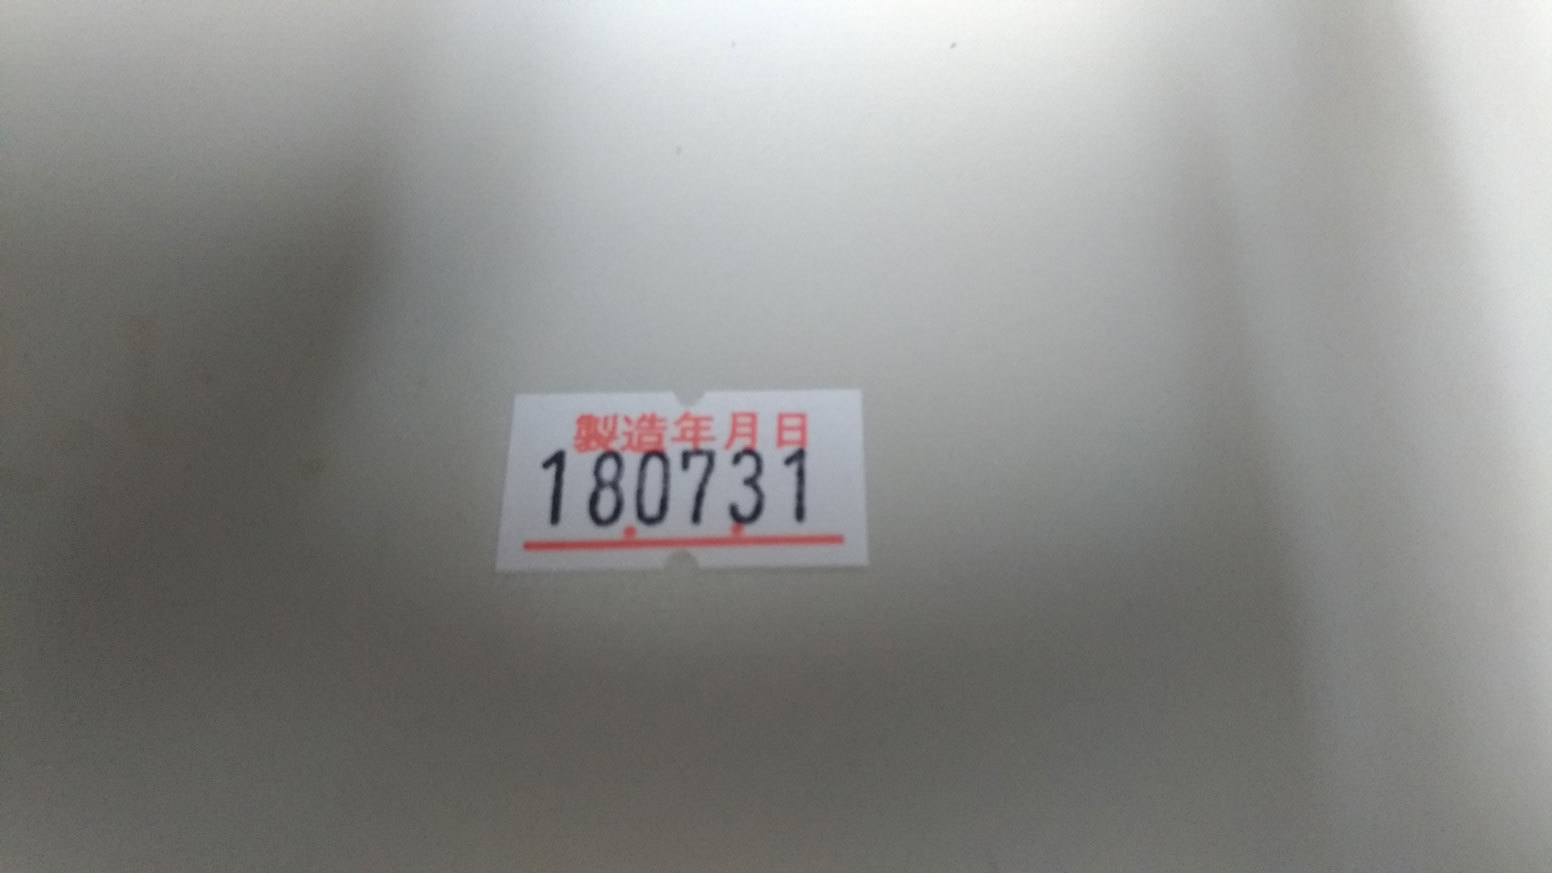 P_20180731_180545_vHDR_Auto.jpg